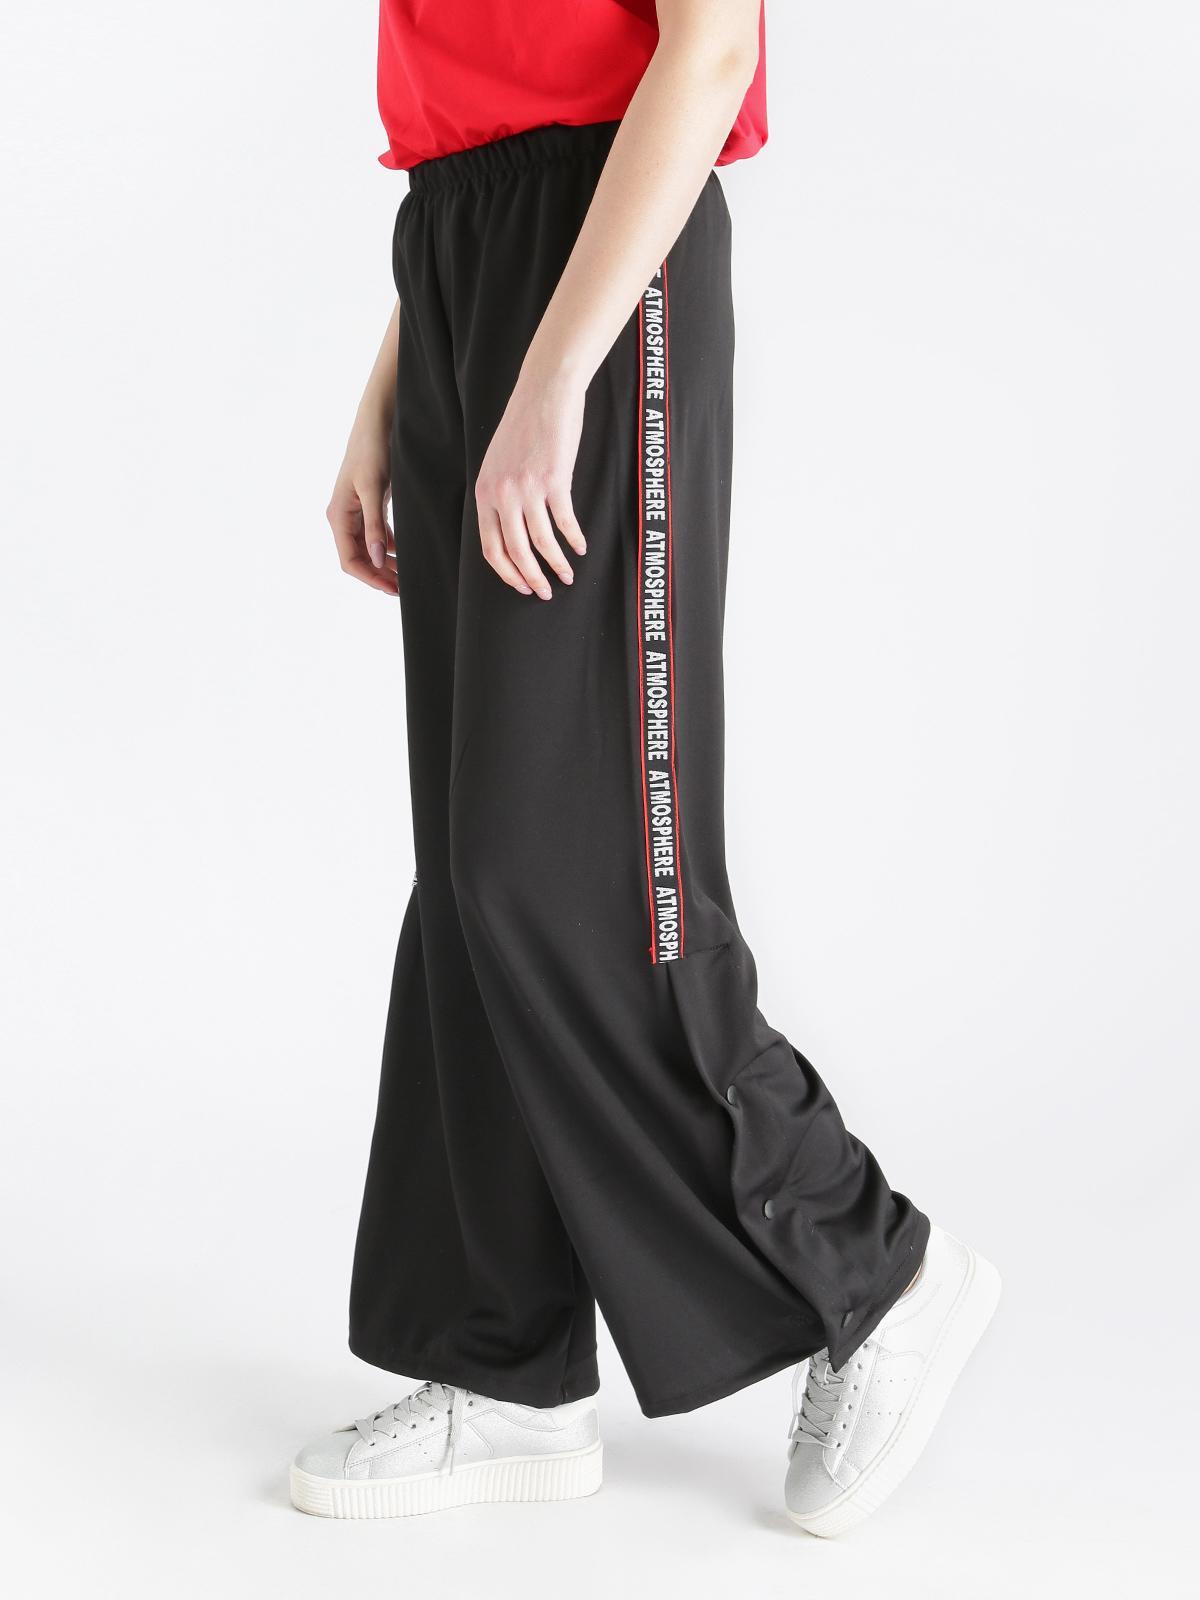 Pantalones Adidas Con Botones Laterales Mujer Authentic F3269 4ebc8